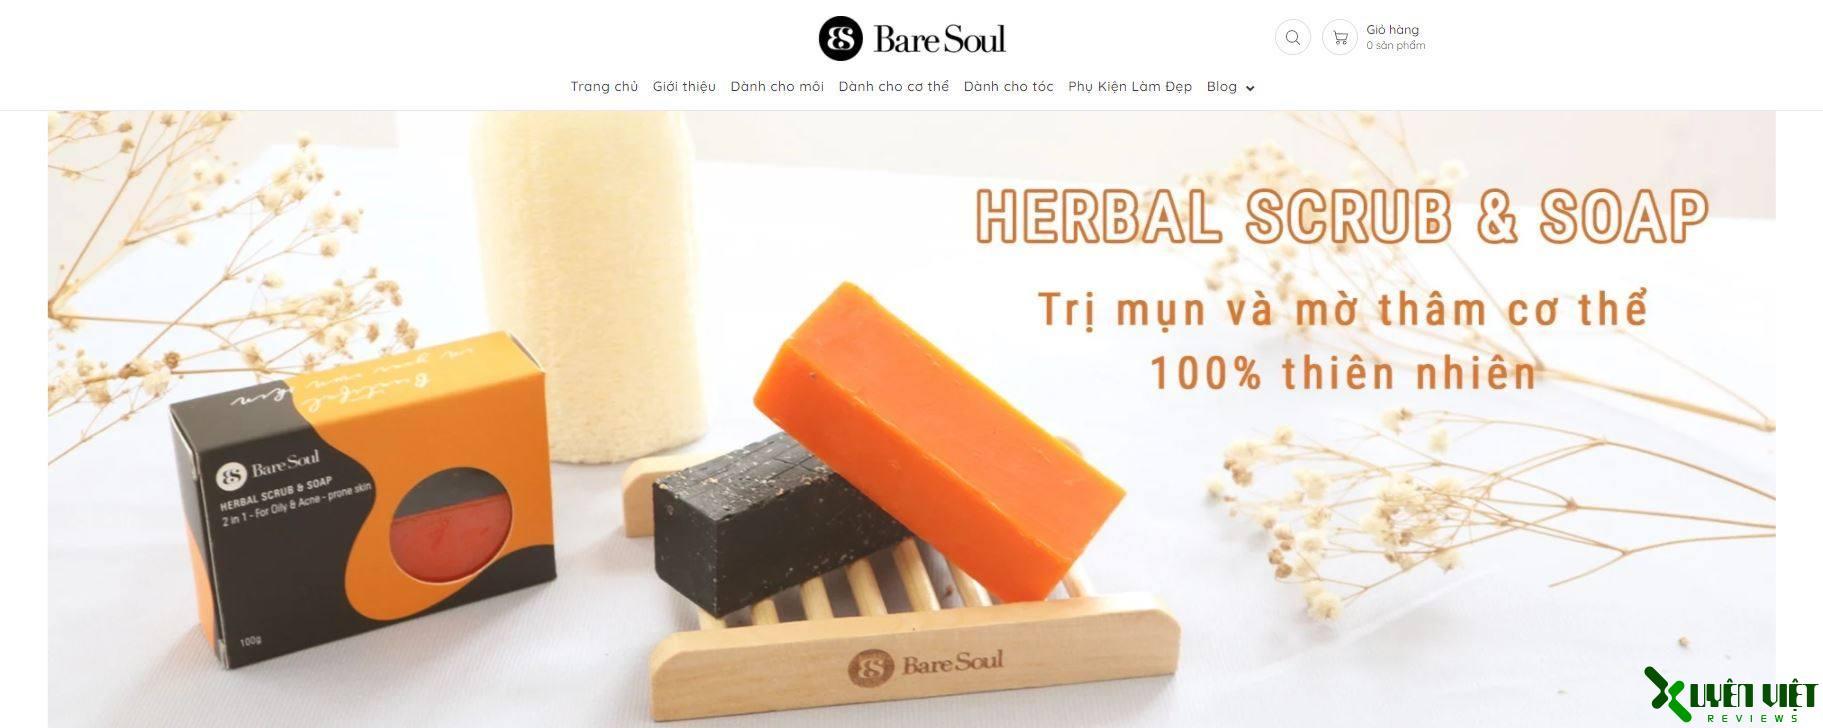 mỹ phẩm bare soul 2